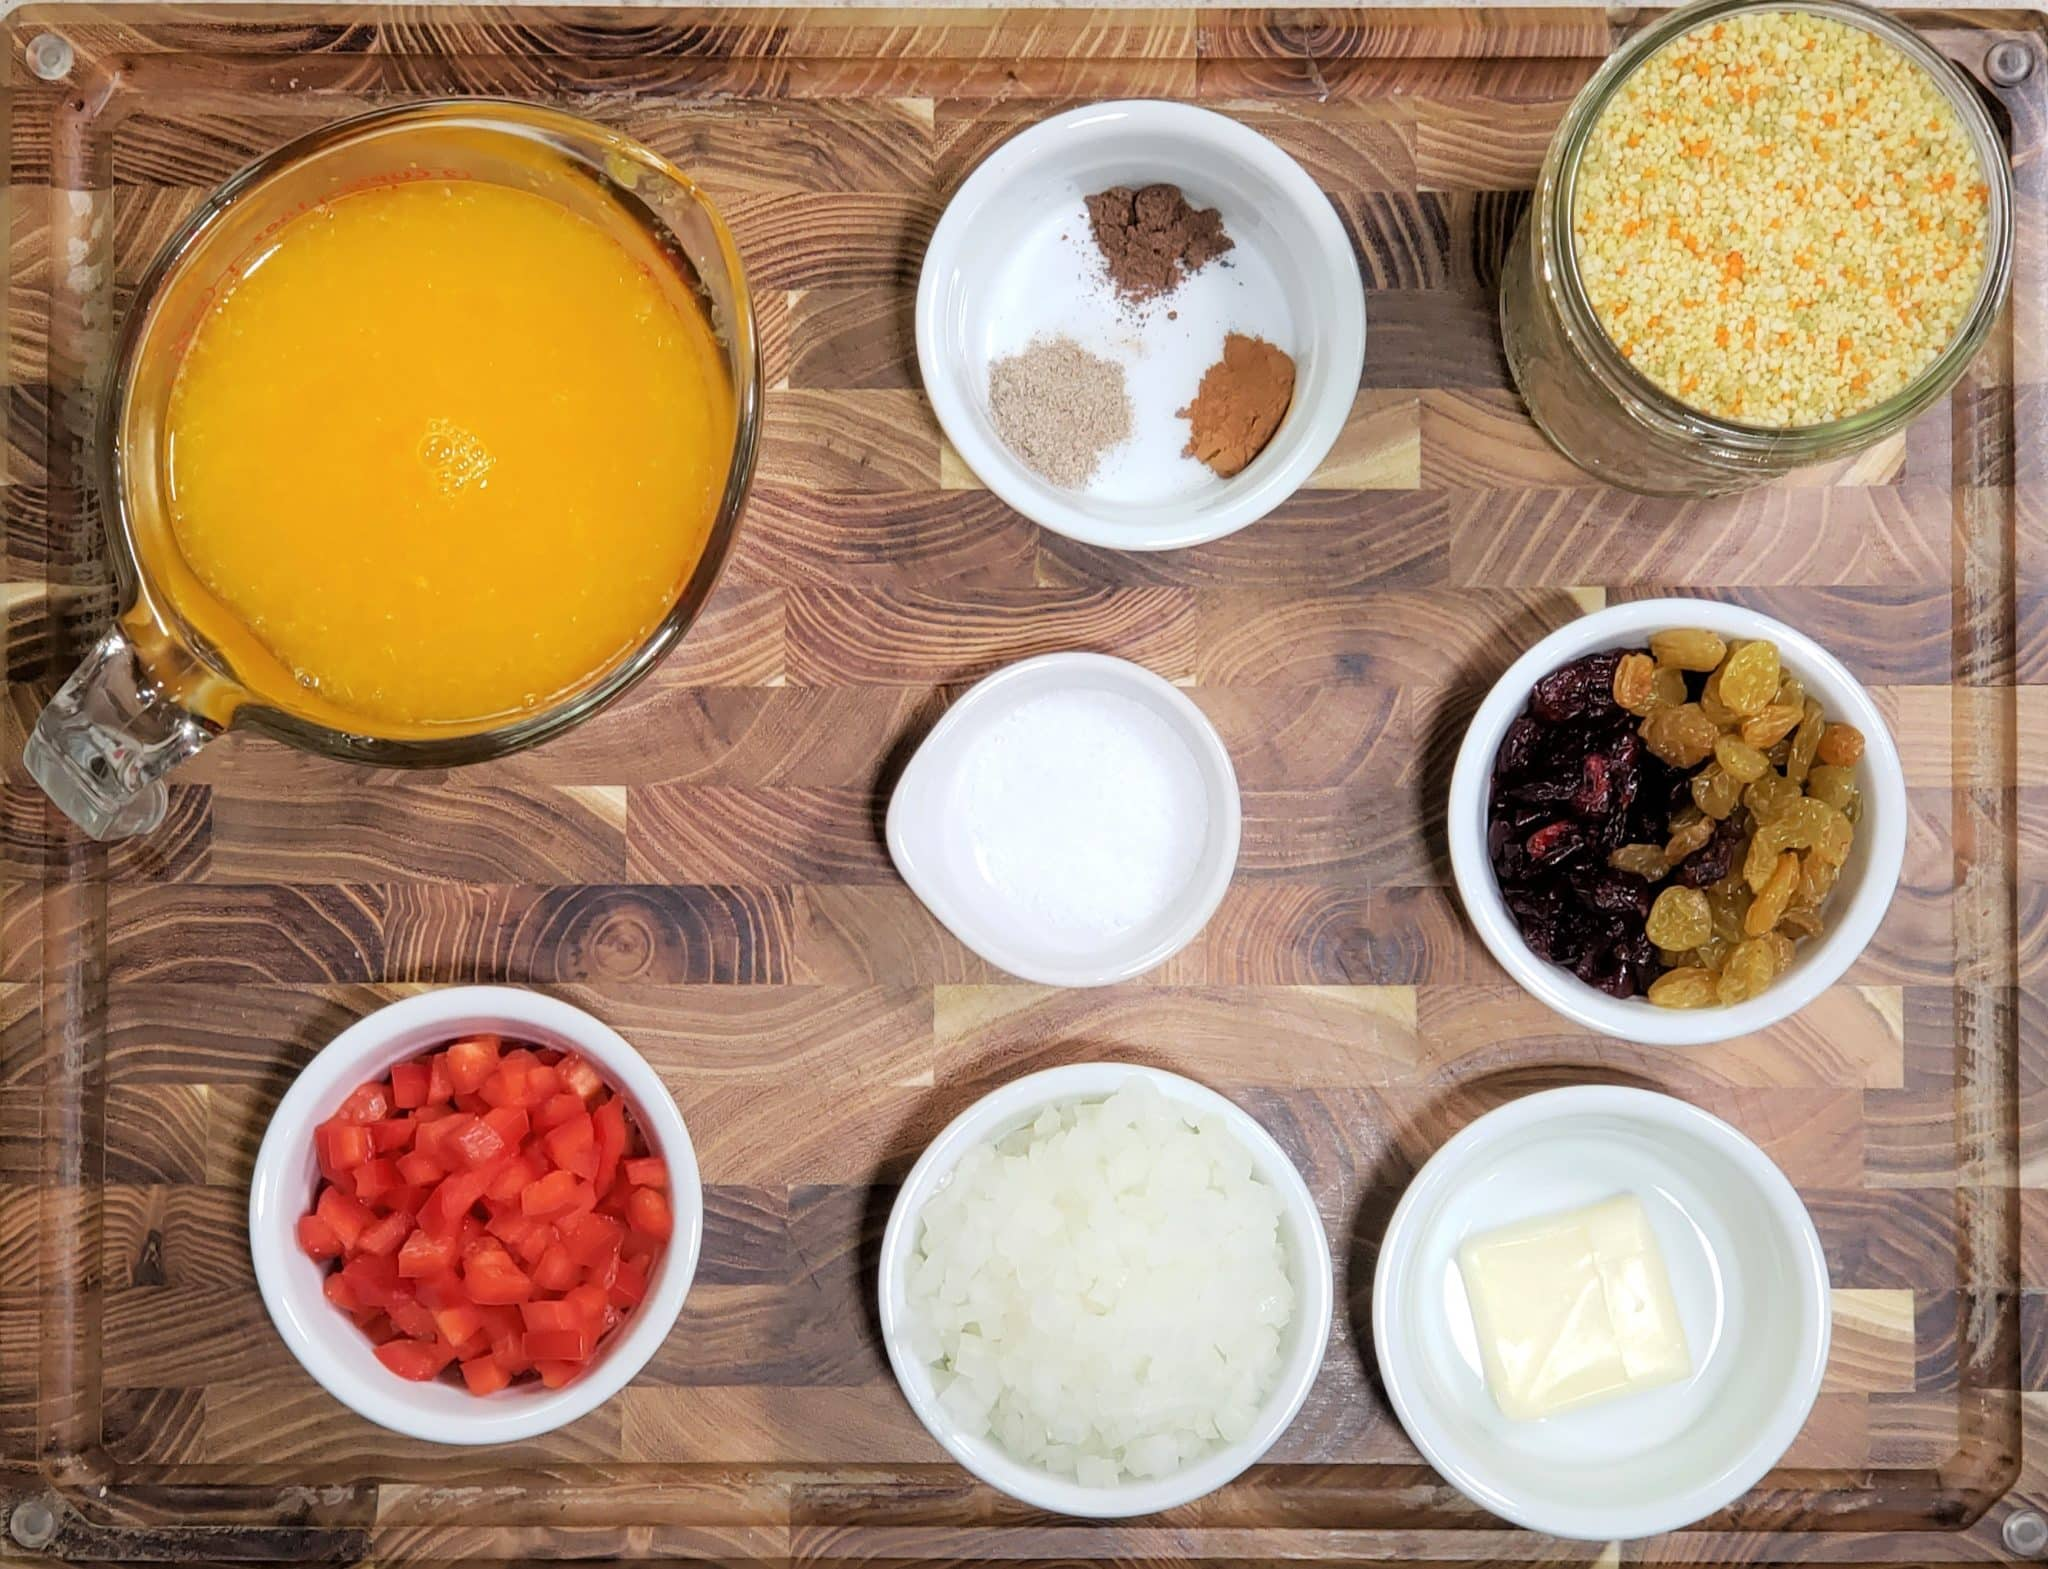 Cast of Ingredients for Instant Pot Cranberry Spice Couscous